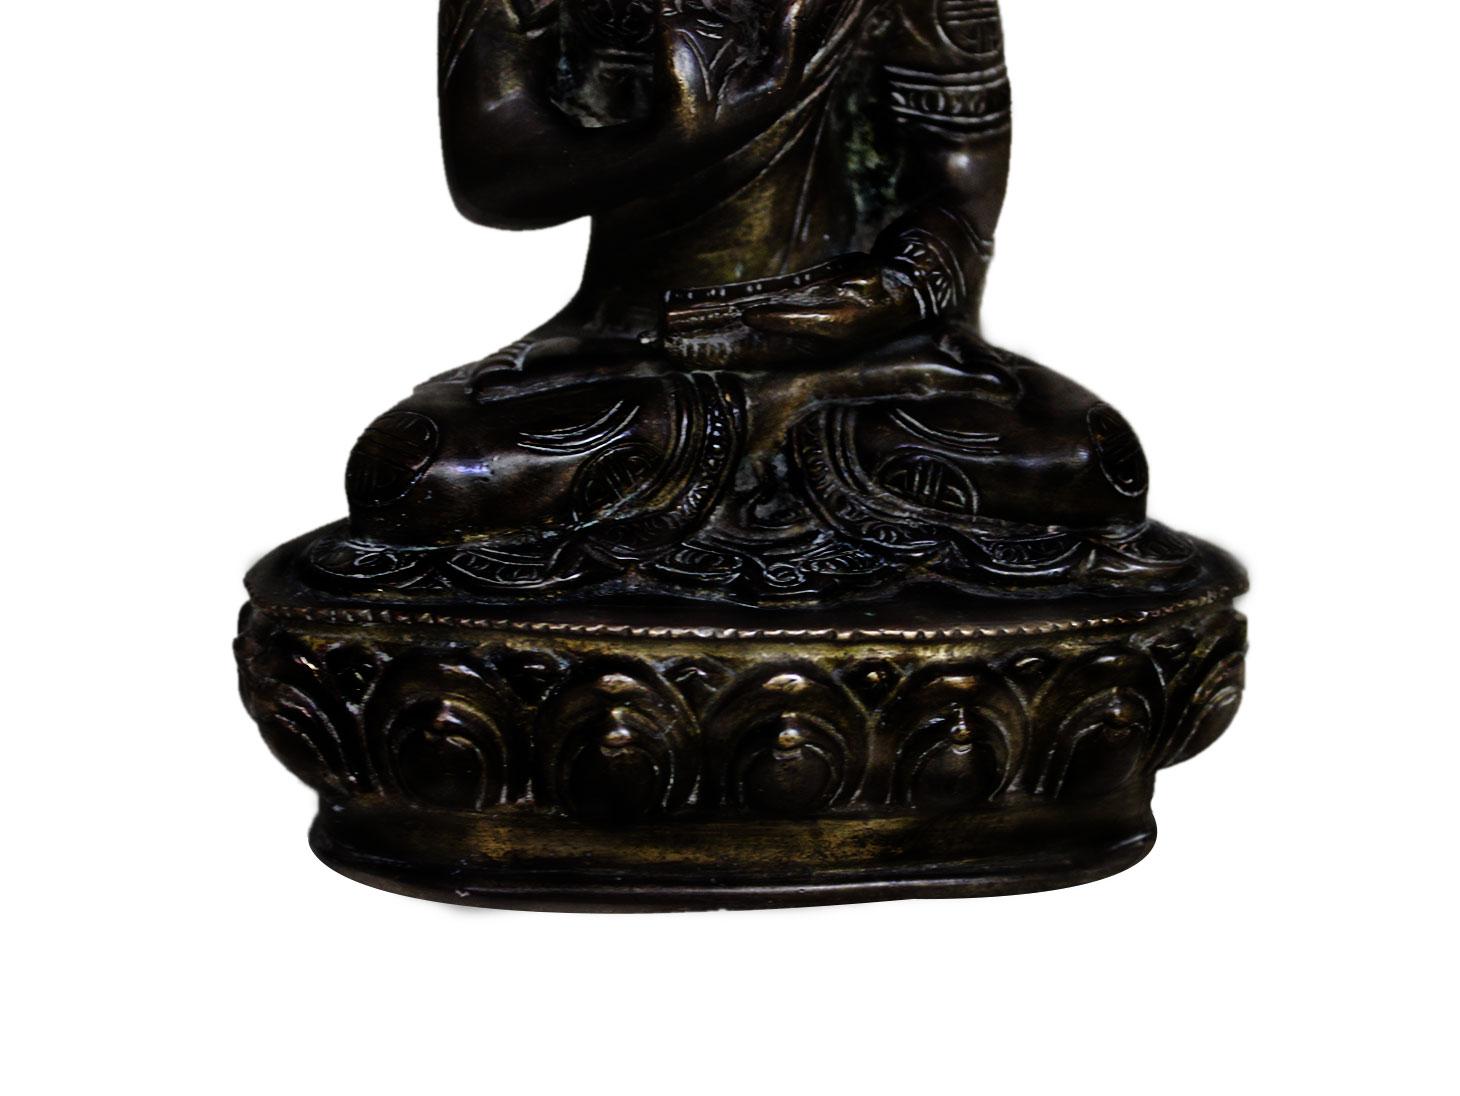 Brass Buddha (Ht-6.7 Inches)